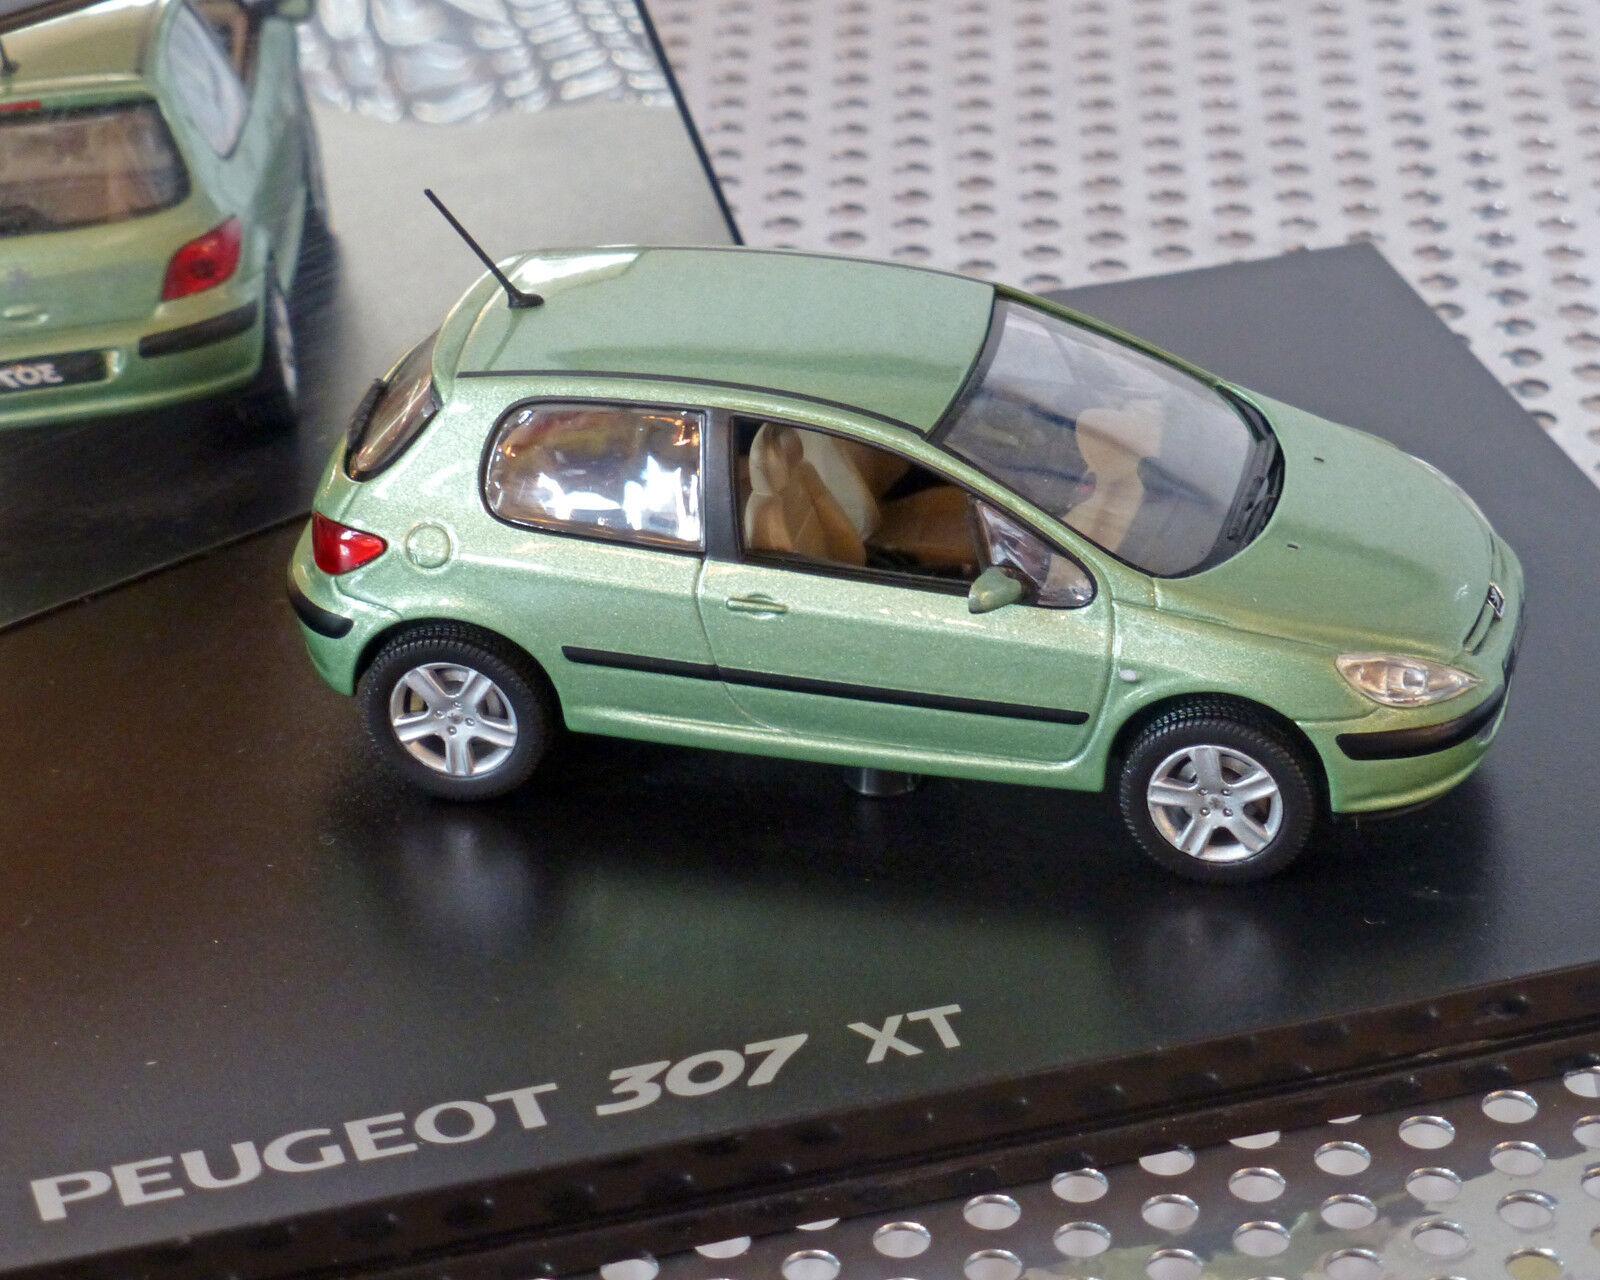 Peugeot 307 verde-metalizado, 1 43, 43, 43, norev d0c58d